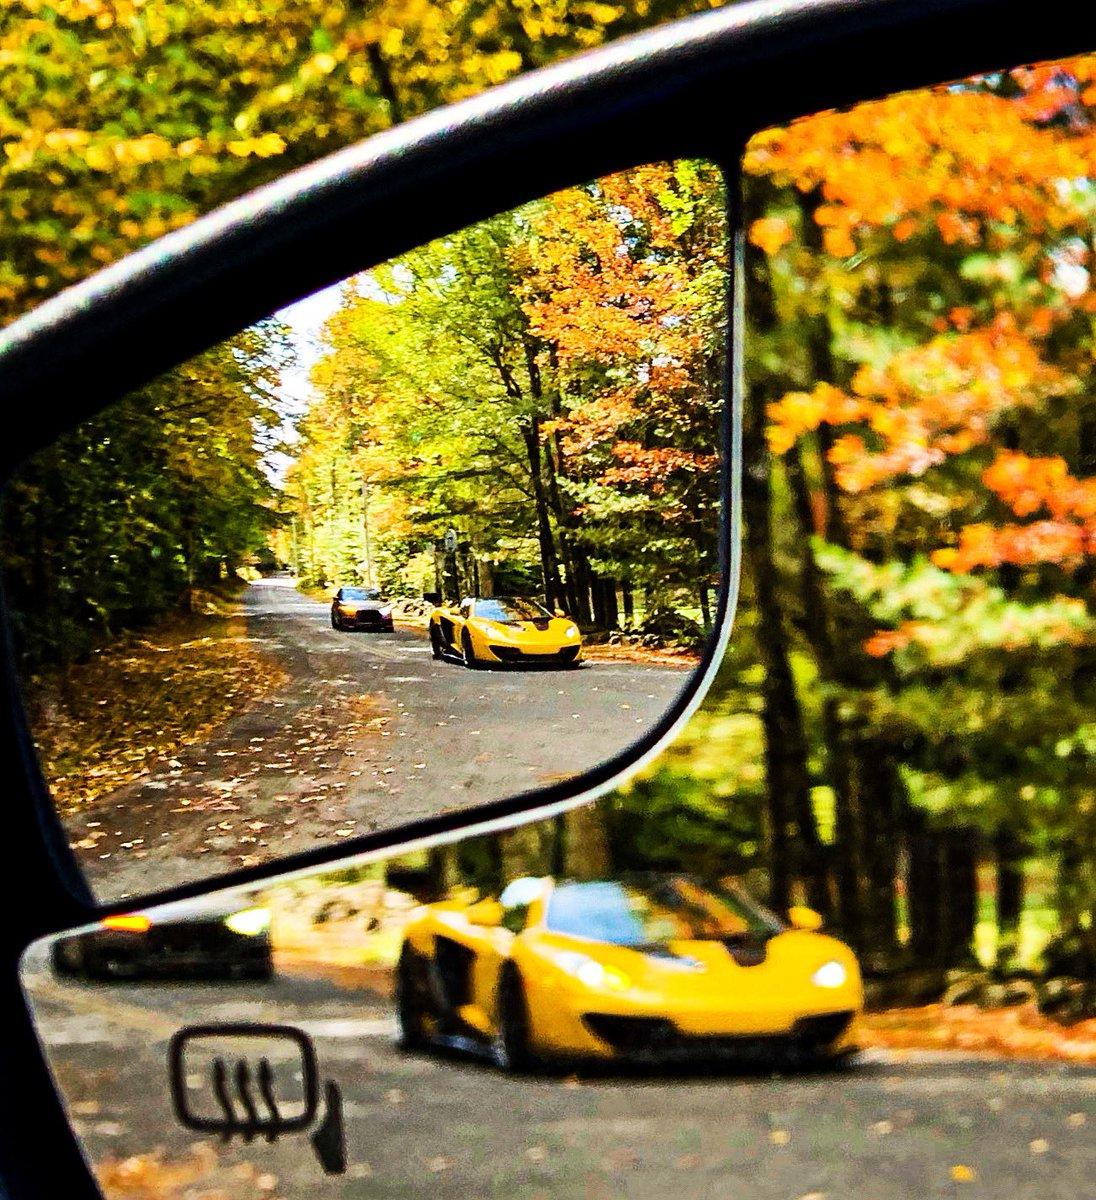 The road less traveled, might be faster. 👀 @mclaren @mclarenauto #mp412c @agwheels #agwheels @automotivesolutionsdedham @gtmjim @audi #audi #audirs3 @gt3rsjeremy @hobbyquarters https://t.co/9e9ST0N8CE